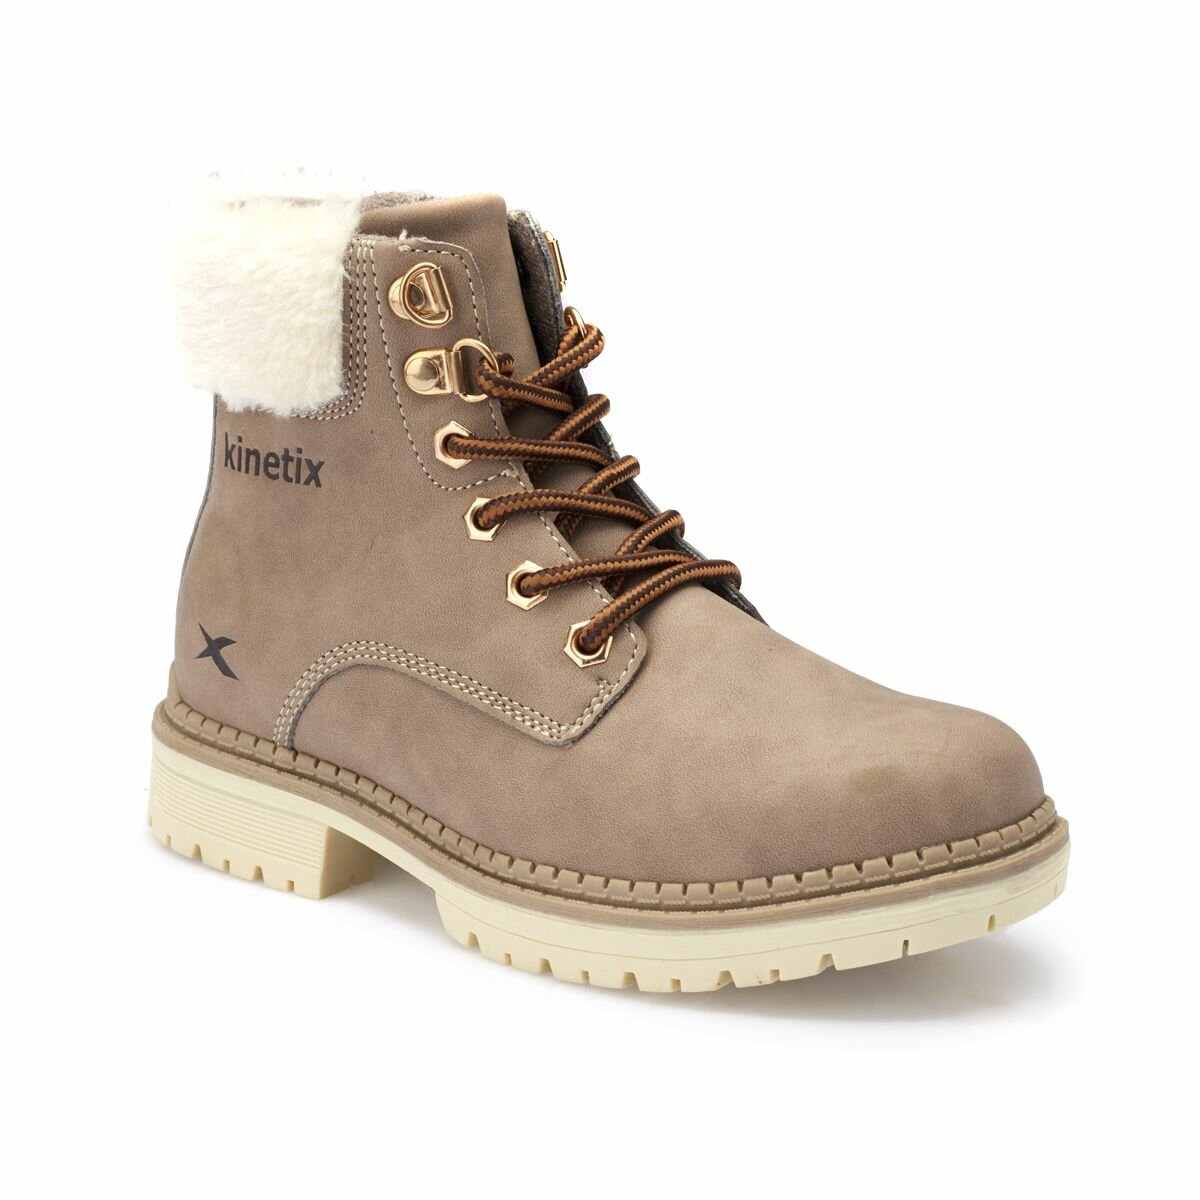 FLO HOWIT Sand Color Male Child Boots KINETIX